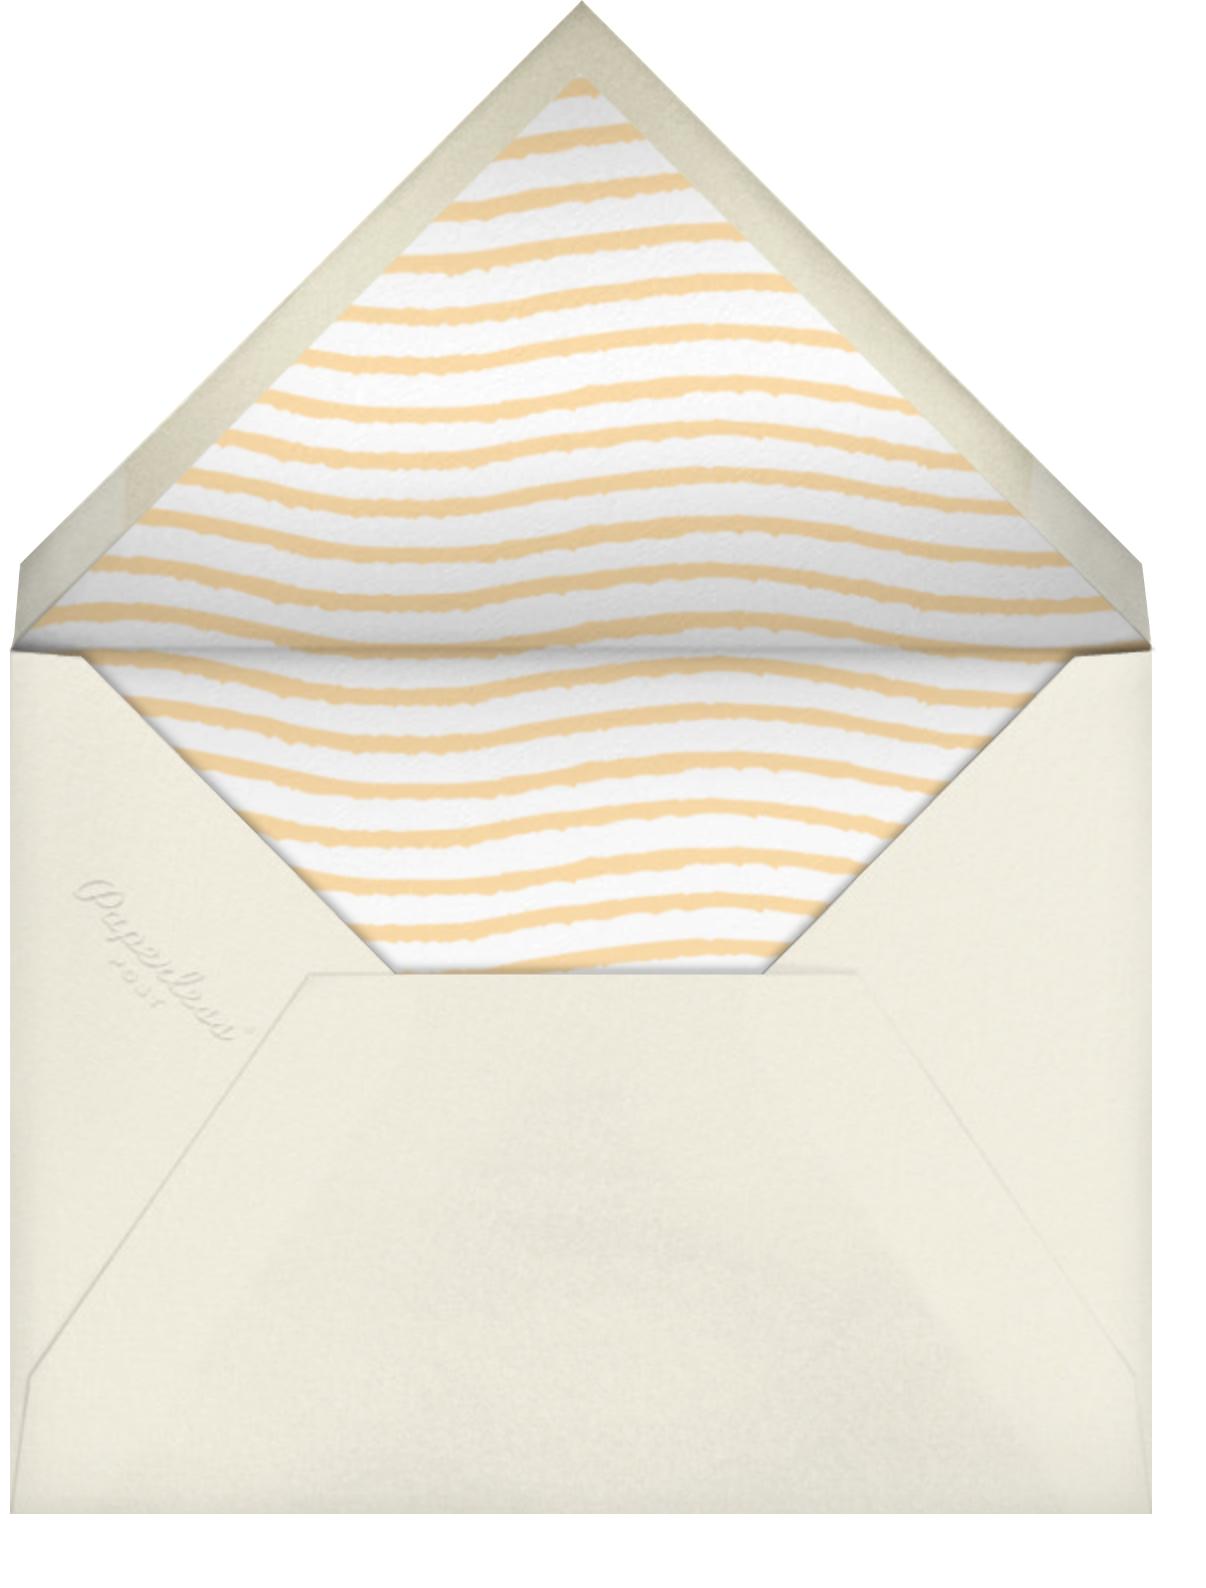 High 5 - Medium - The Indigo Bunting - Congratulations - envelope back